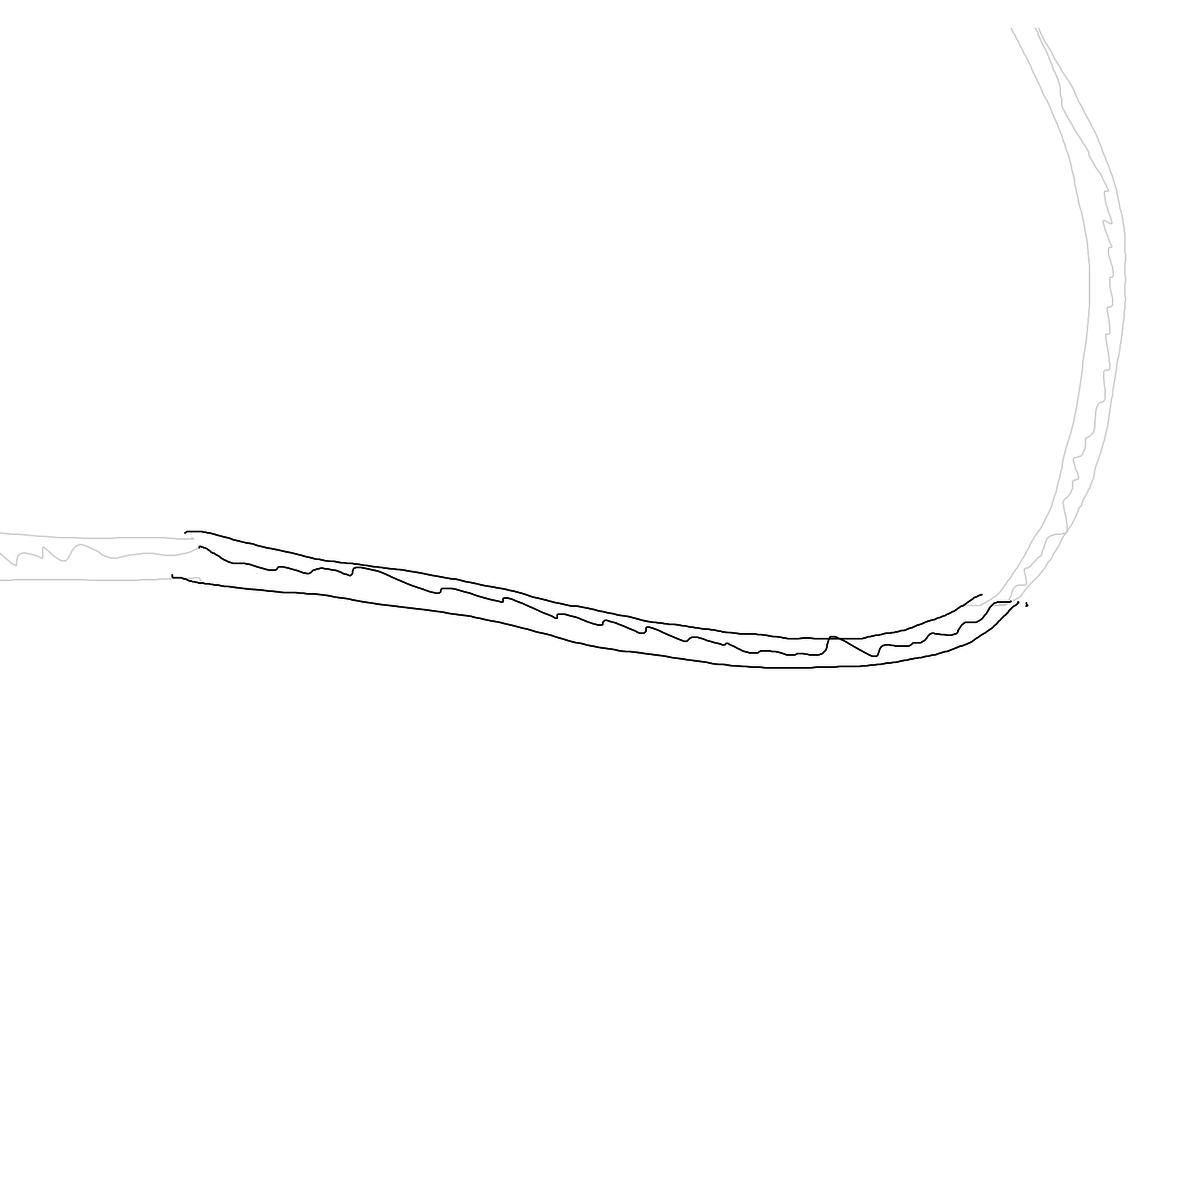 BAAAM drawing#23556 lat:41.7692527770996100lng: -72.9645690917968800